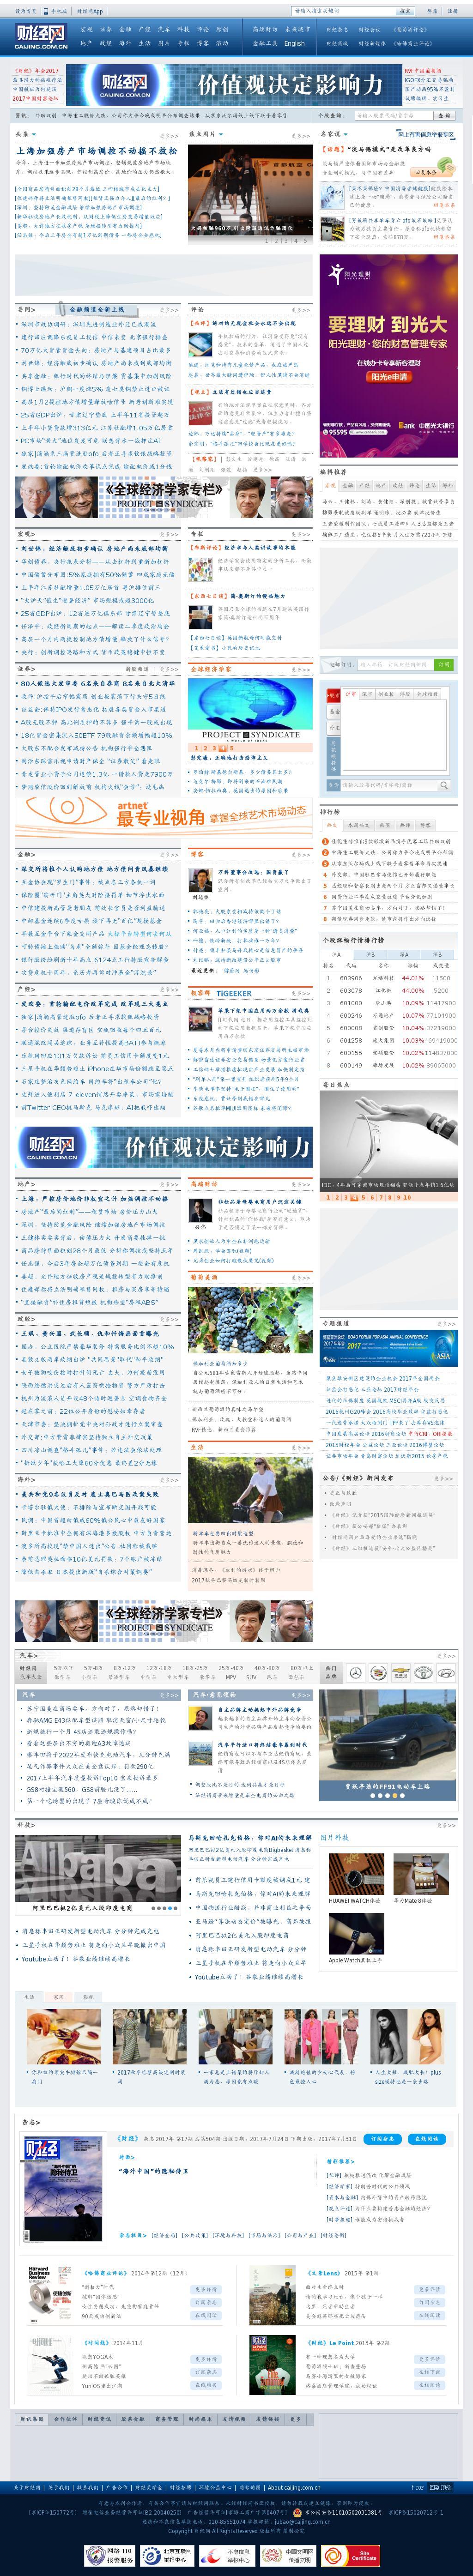 Caijing at Wednesday July 26, 2017, 10:02 a.m. UTC